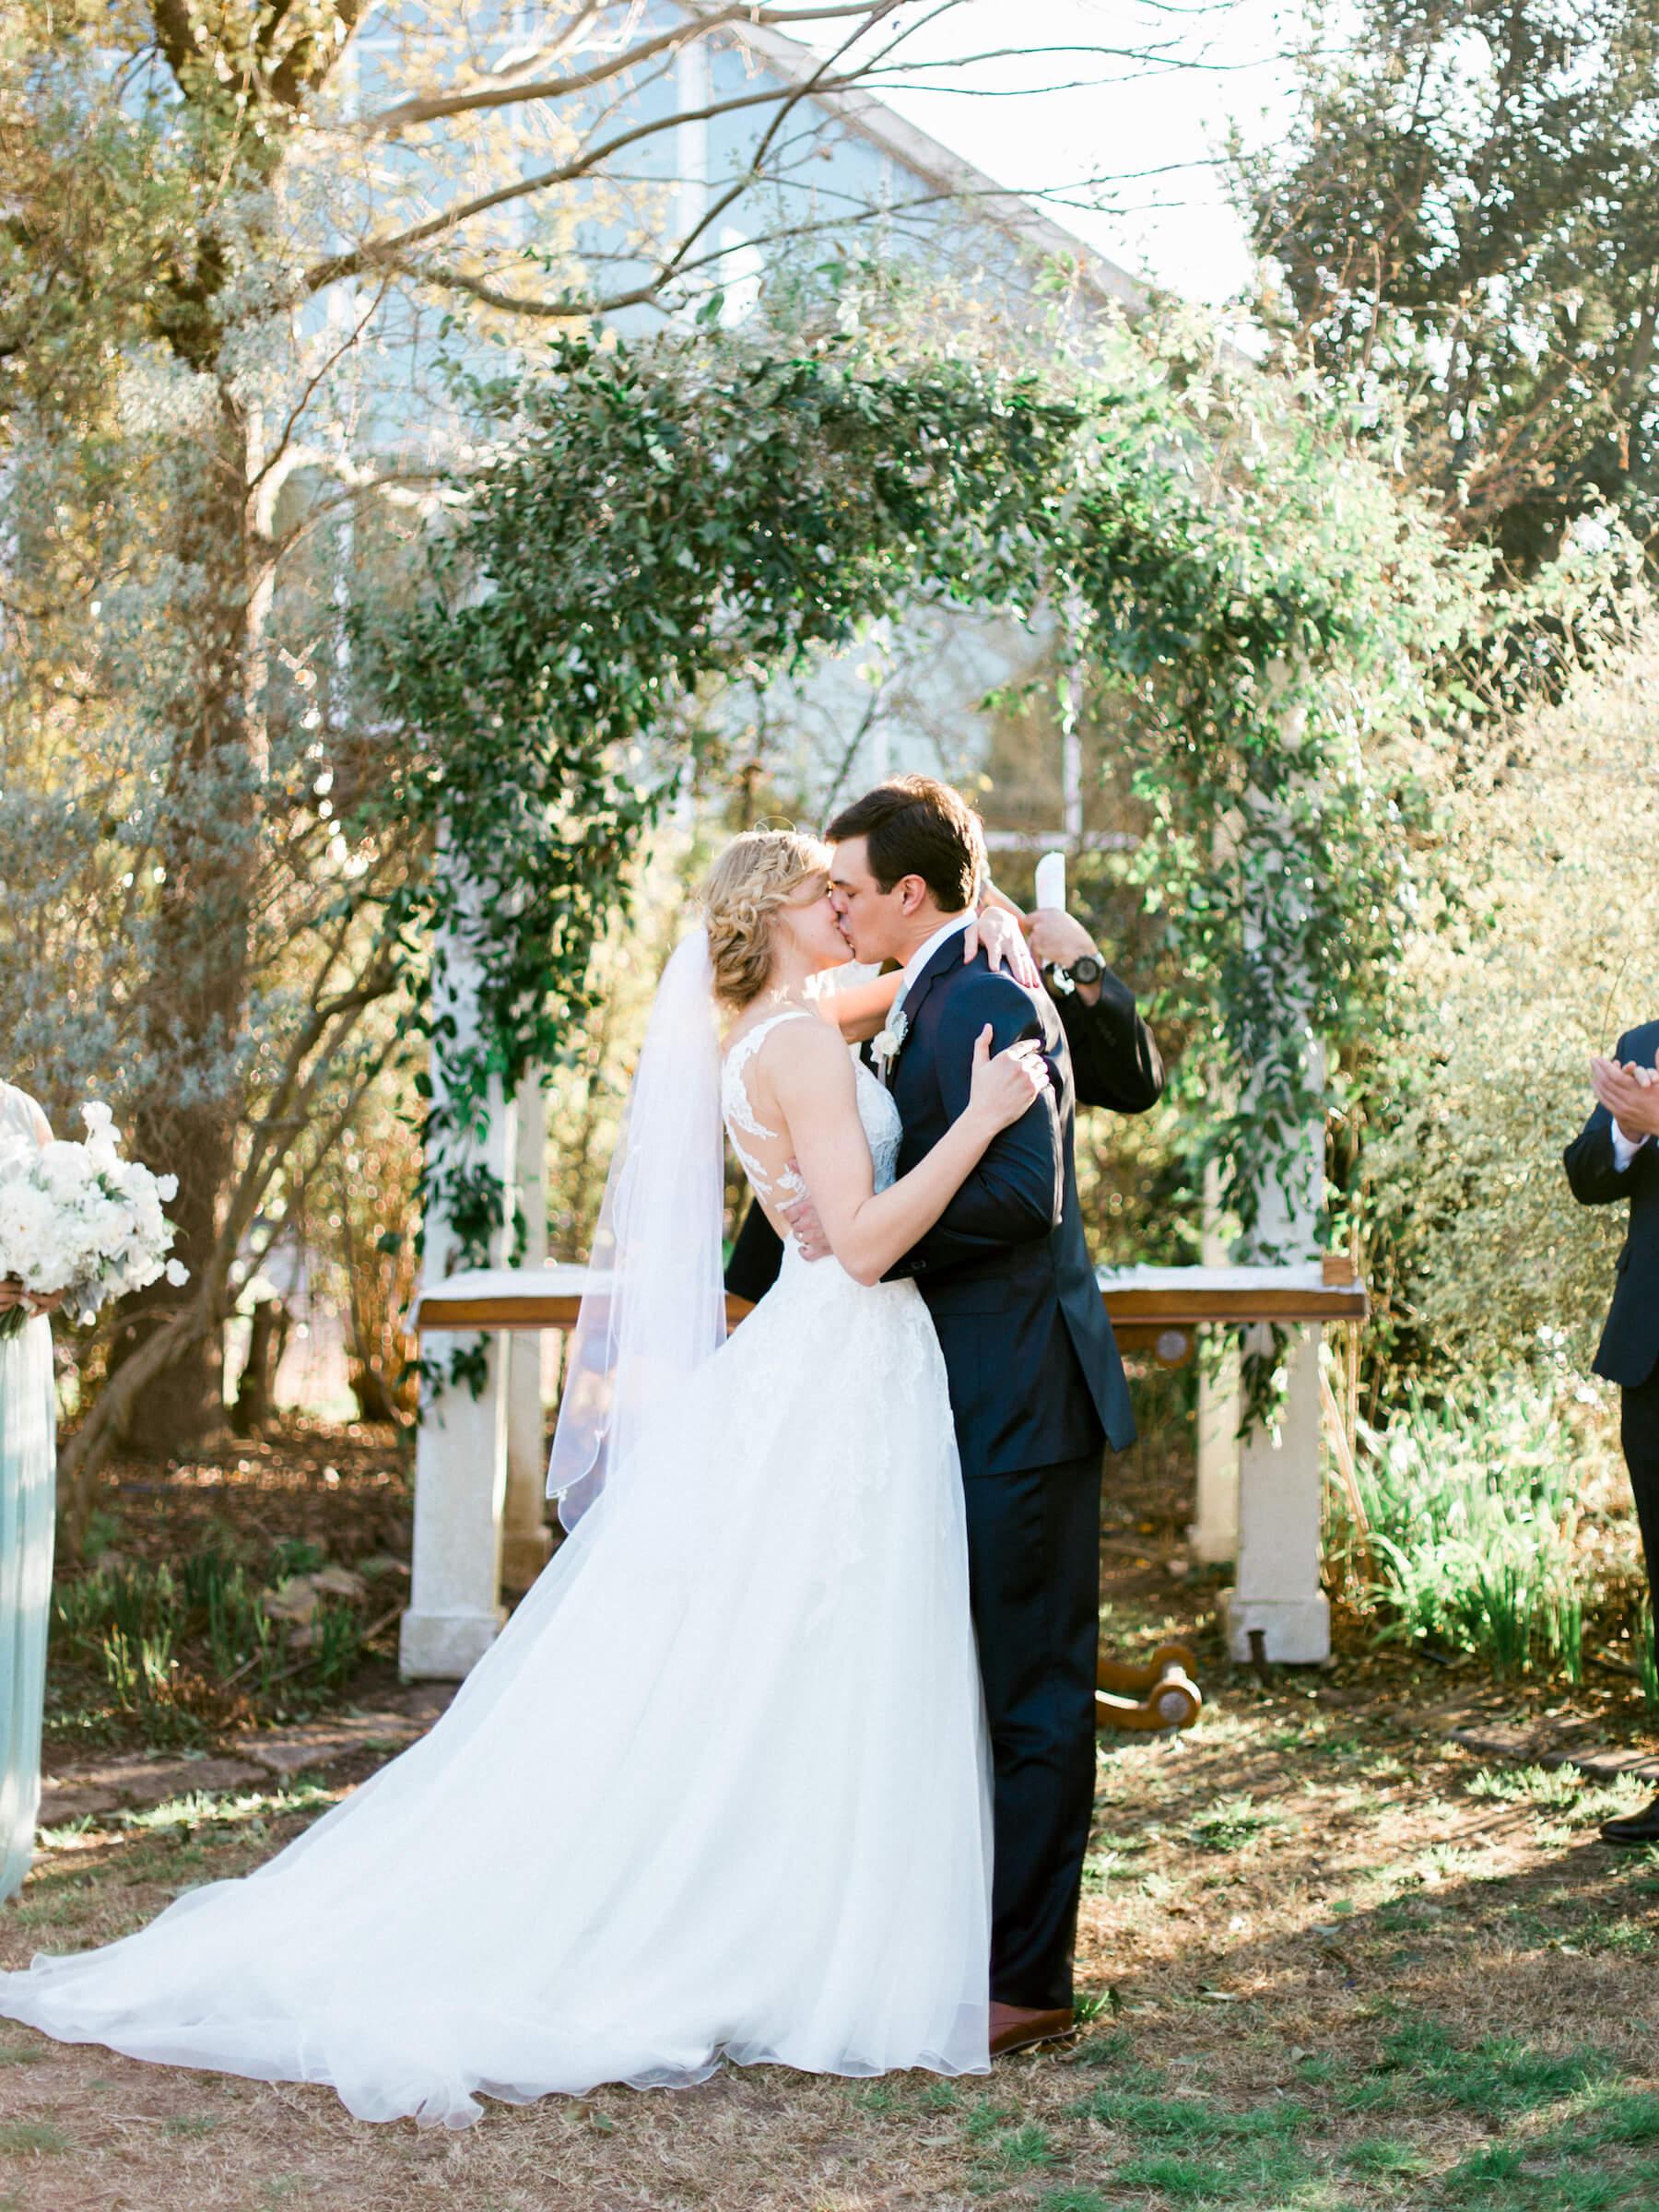 keara-william-wedding-469-2.jpg